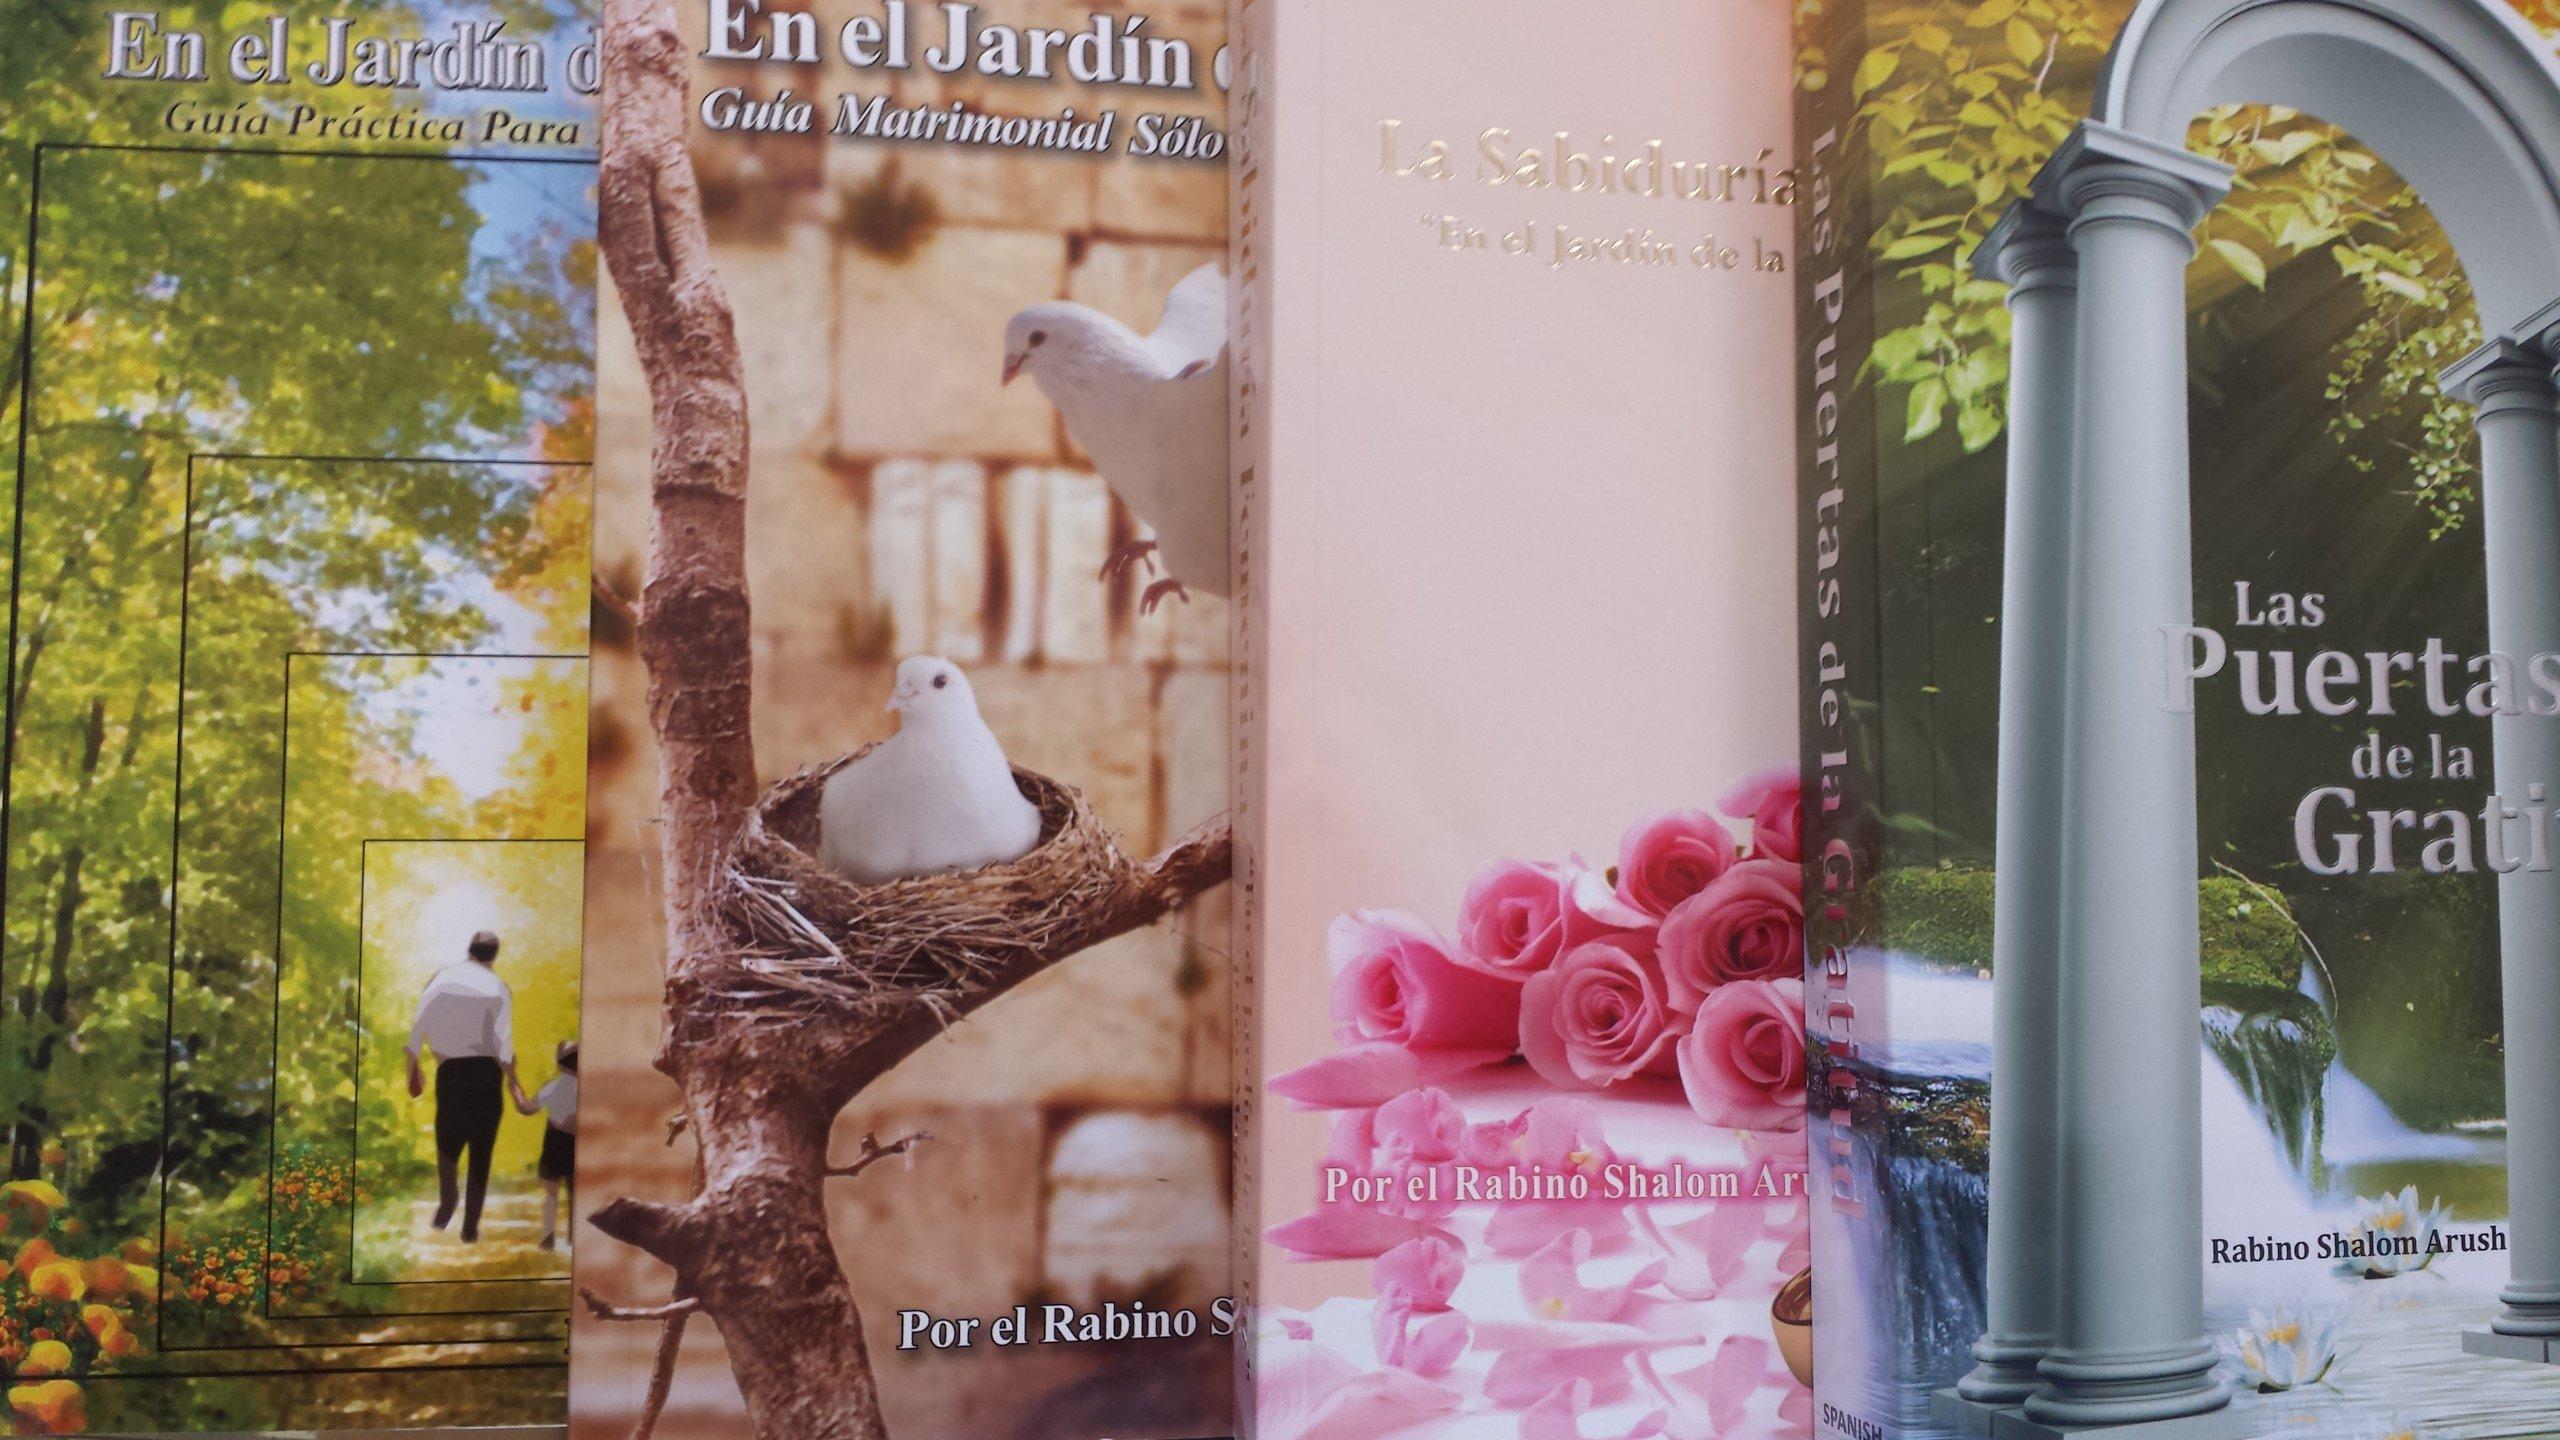 6 Libros Del Rav Arush: Rabino Shalom Arush: Amazon.com: Books